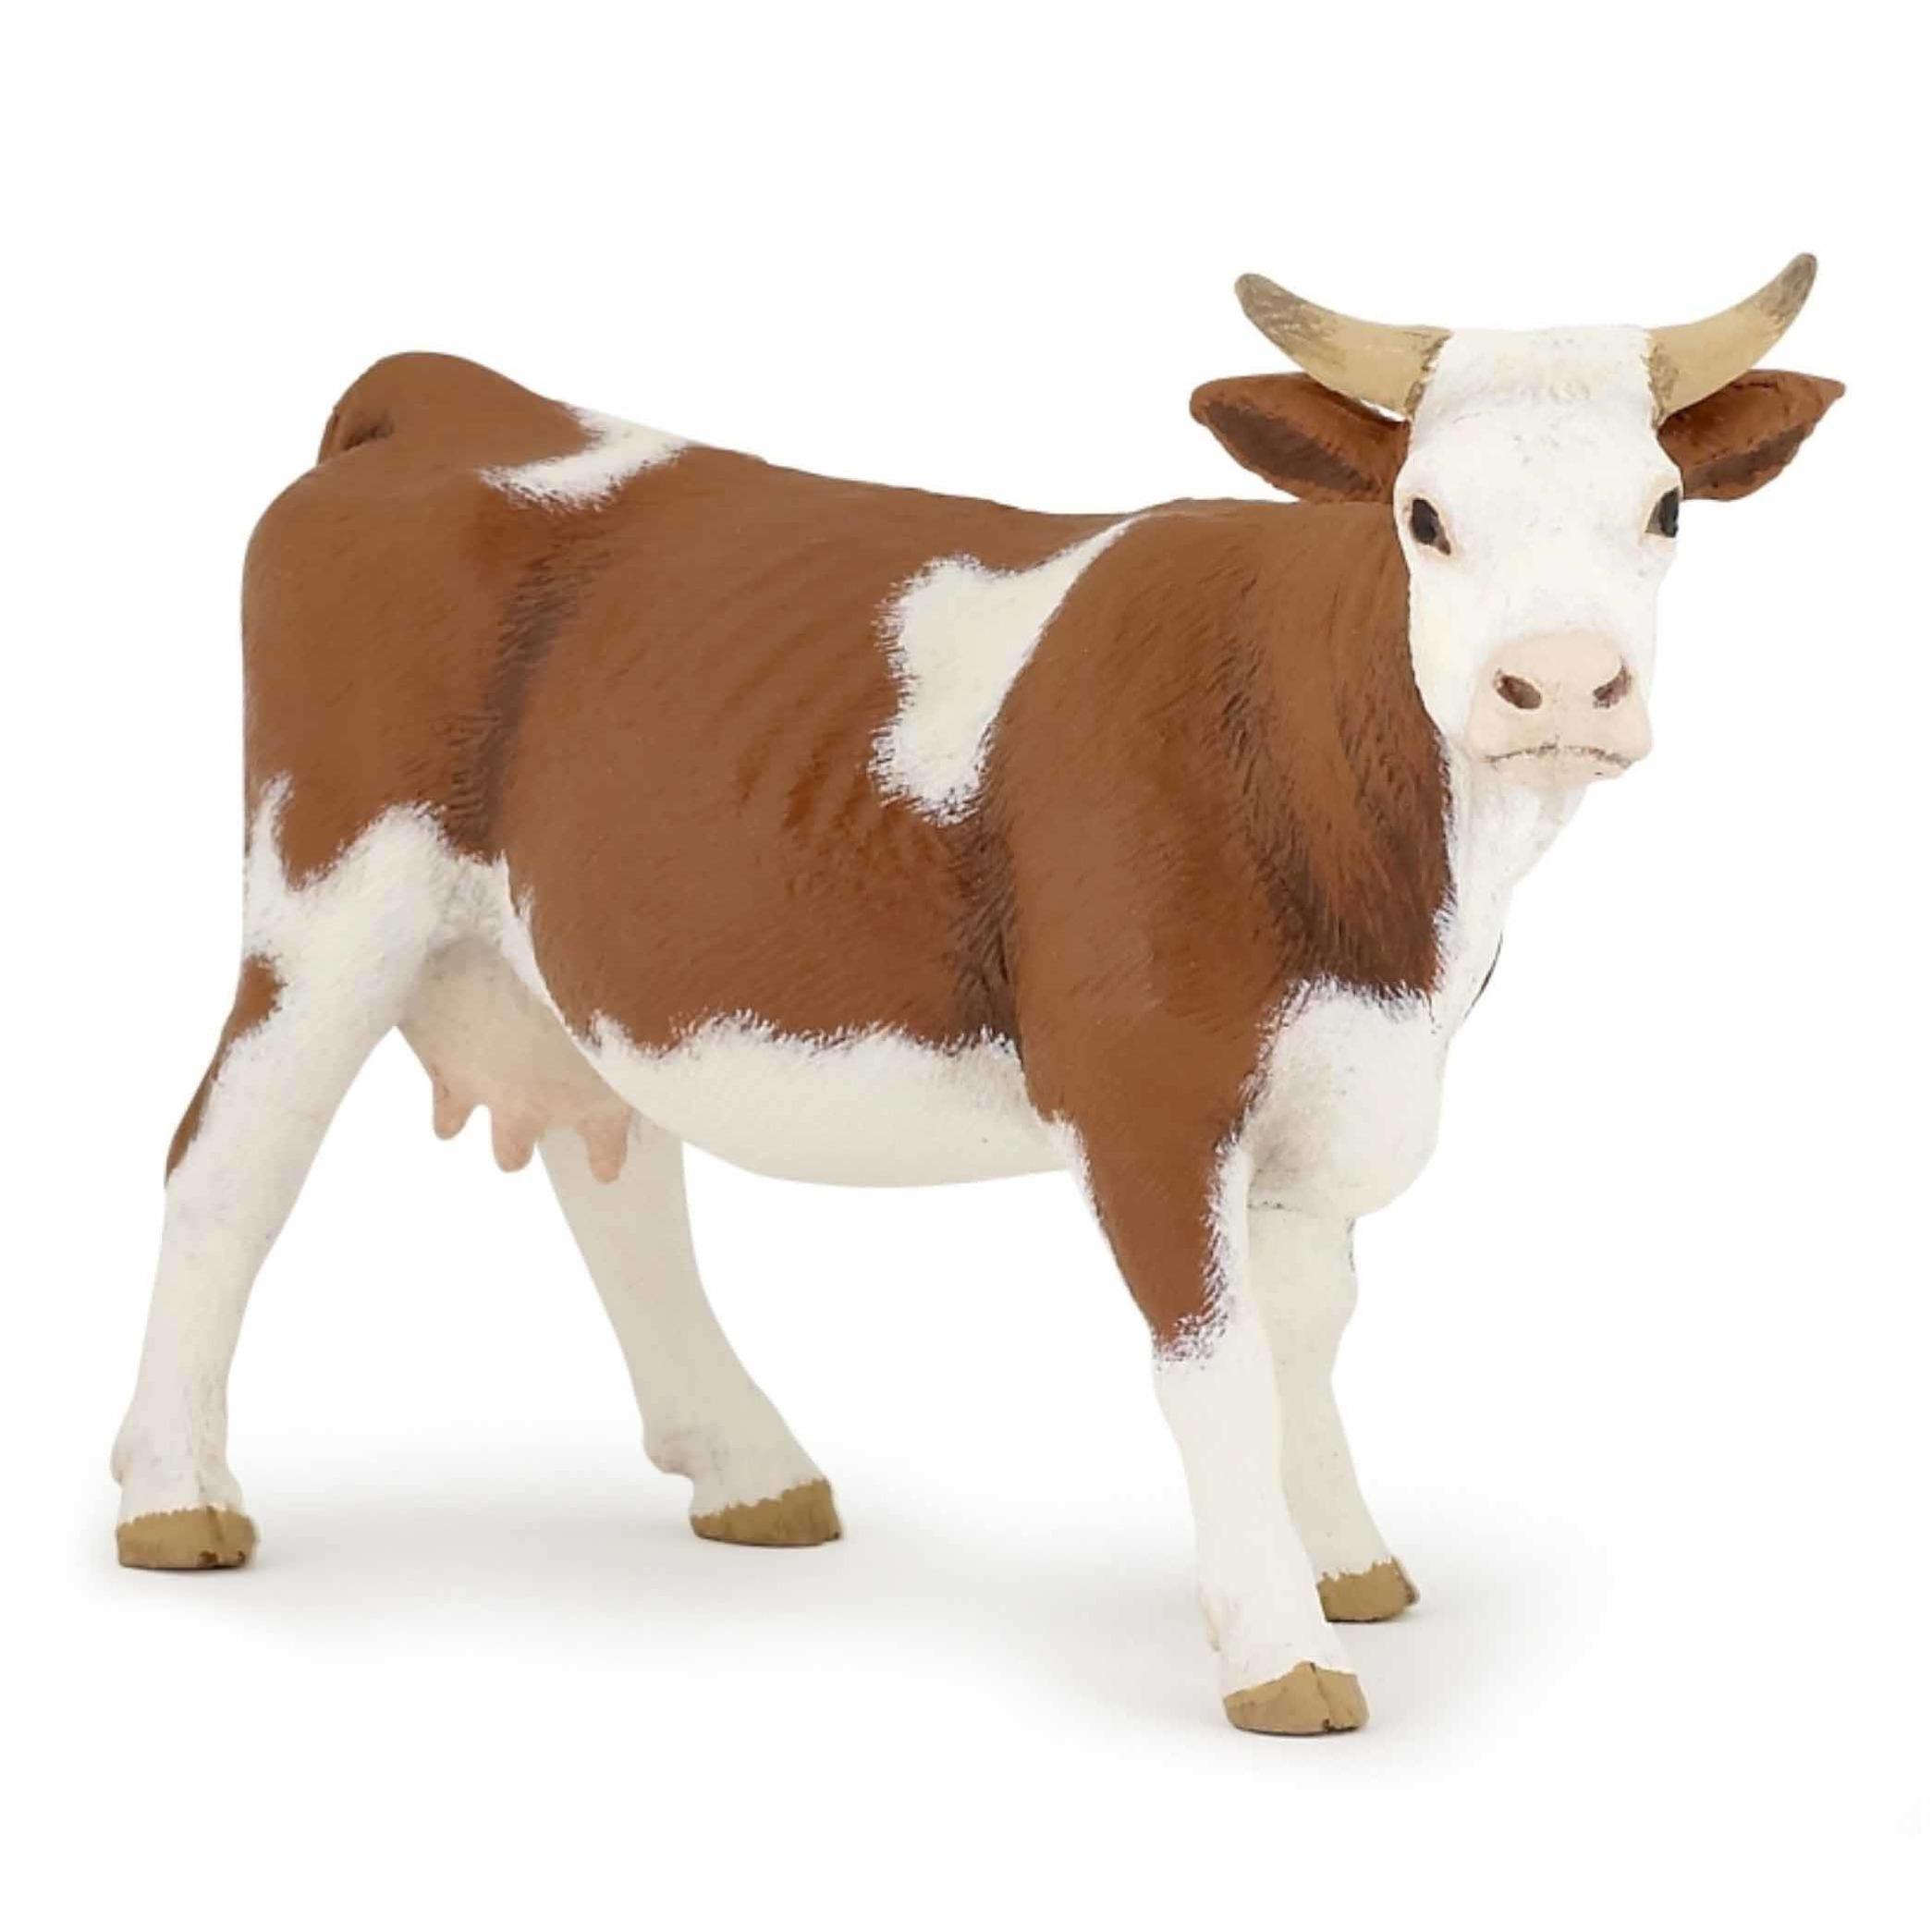 Image of Bruine koe speelfiguur van plastic